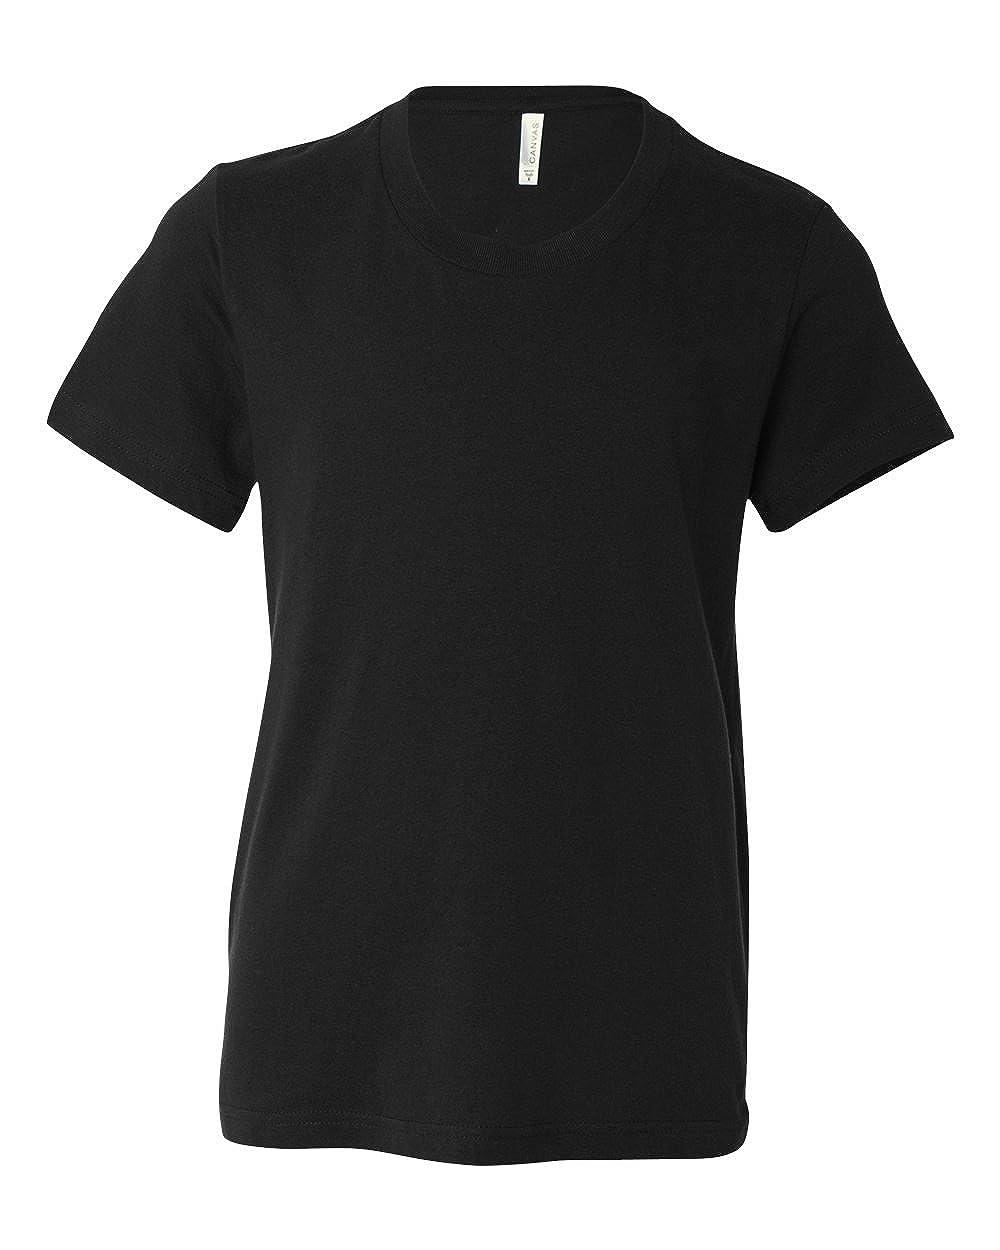 Bella Canvas Boys Youth Jersey Short-Sleeve T-Shirt